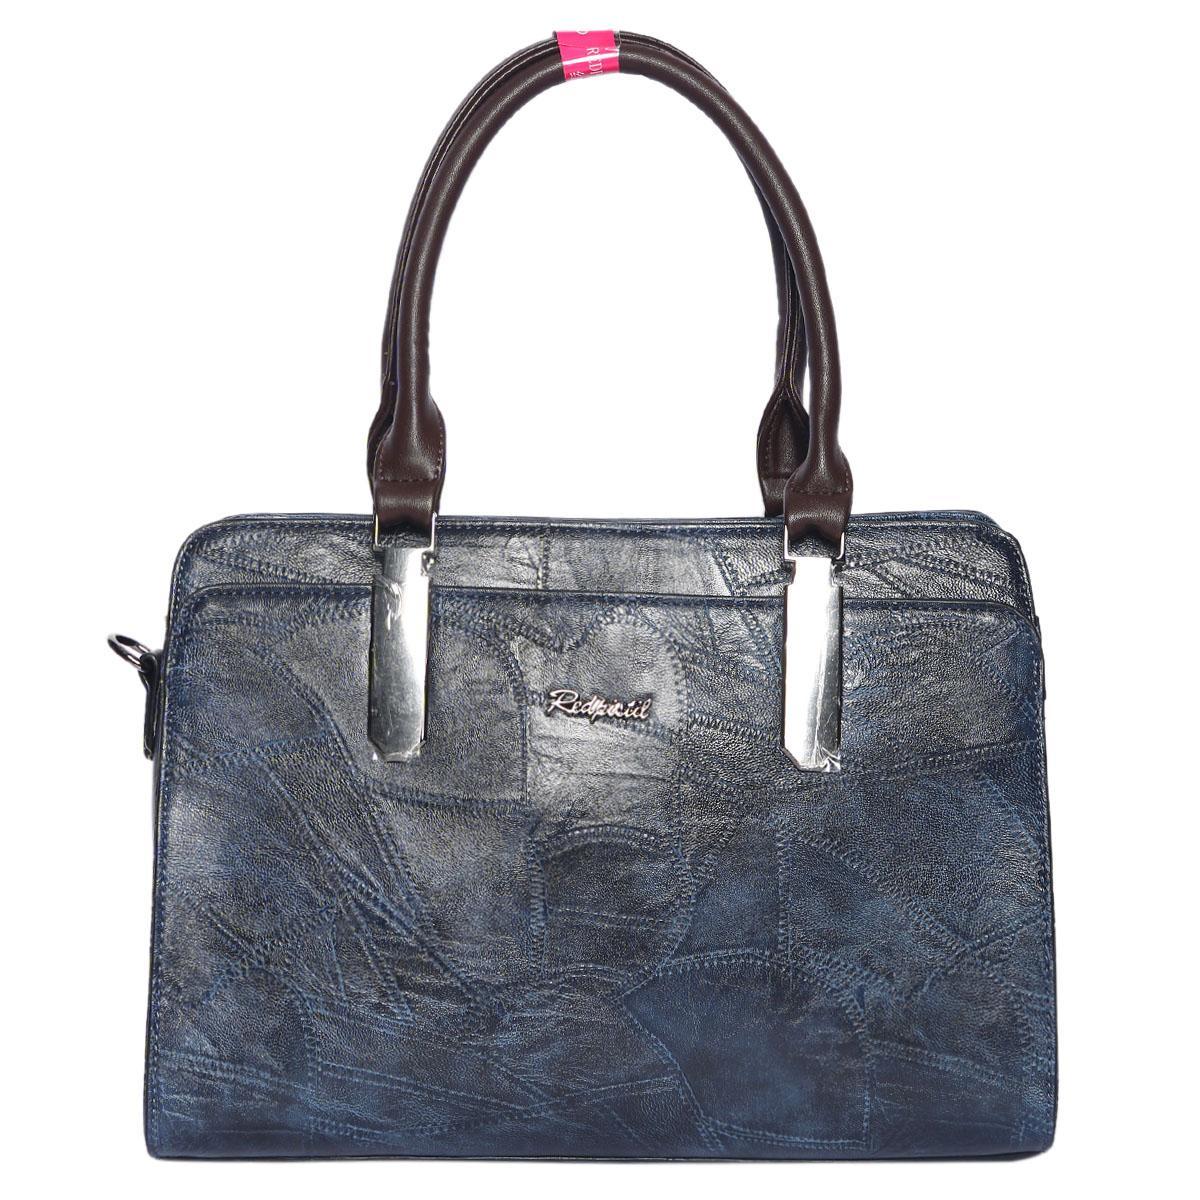 d2c64f21b14b Ladies Handbags & Women's Handbags In Bangladesh At Best Price ...